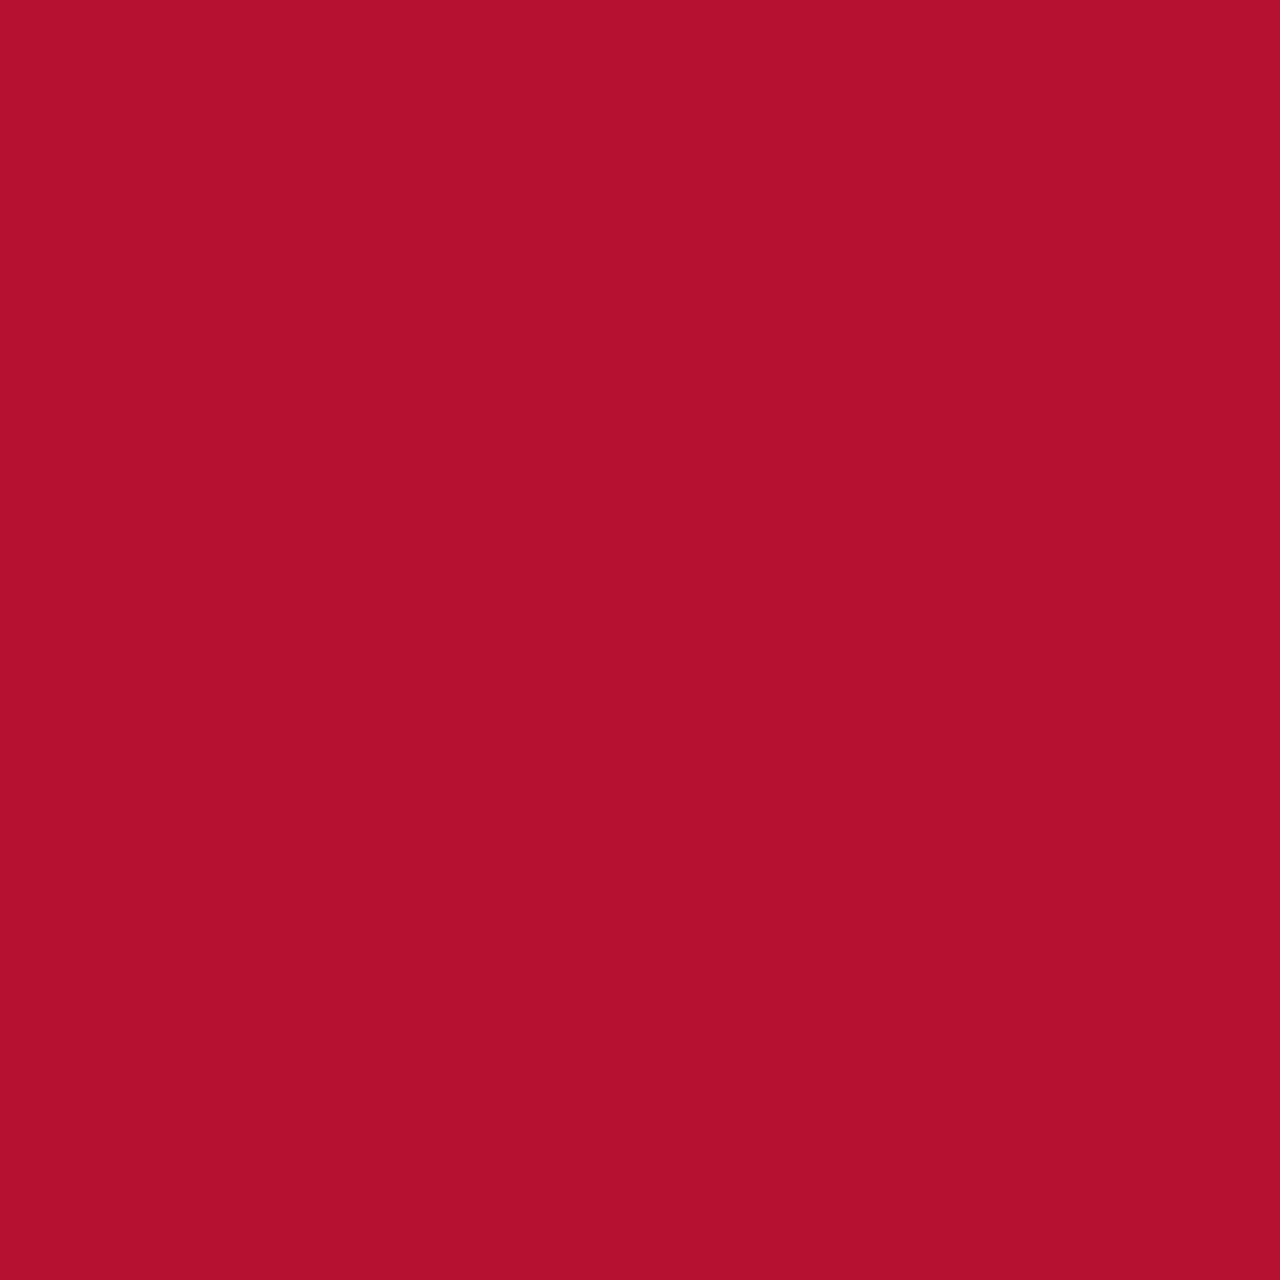 "#0042 Rosco Gels Roscolux Deep Salmon, 20x24"""